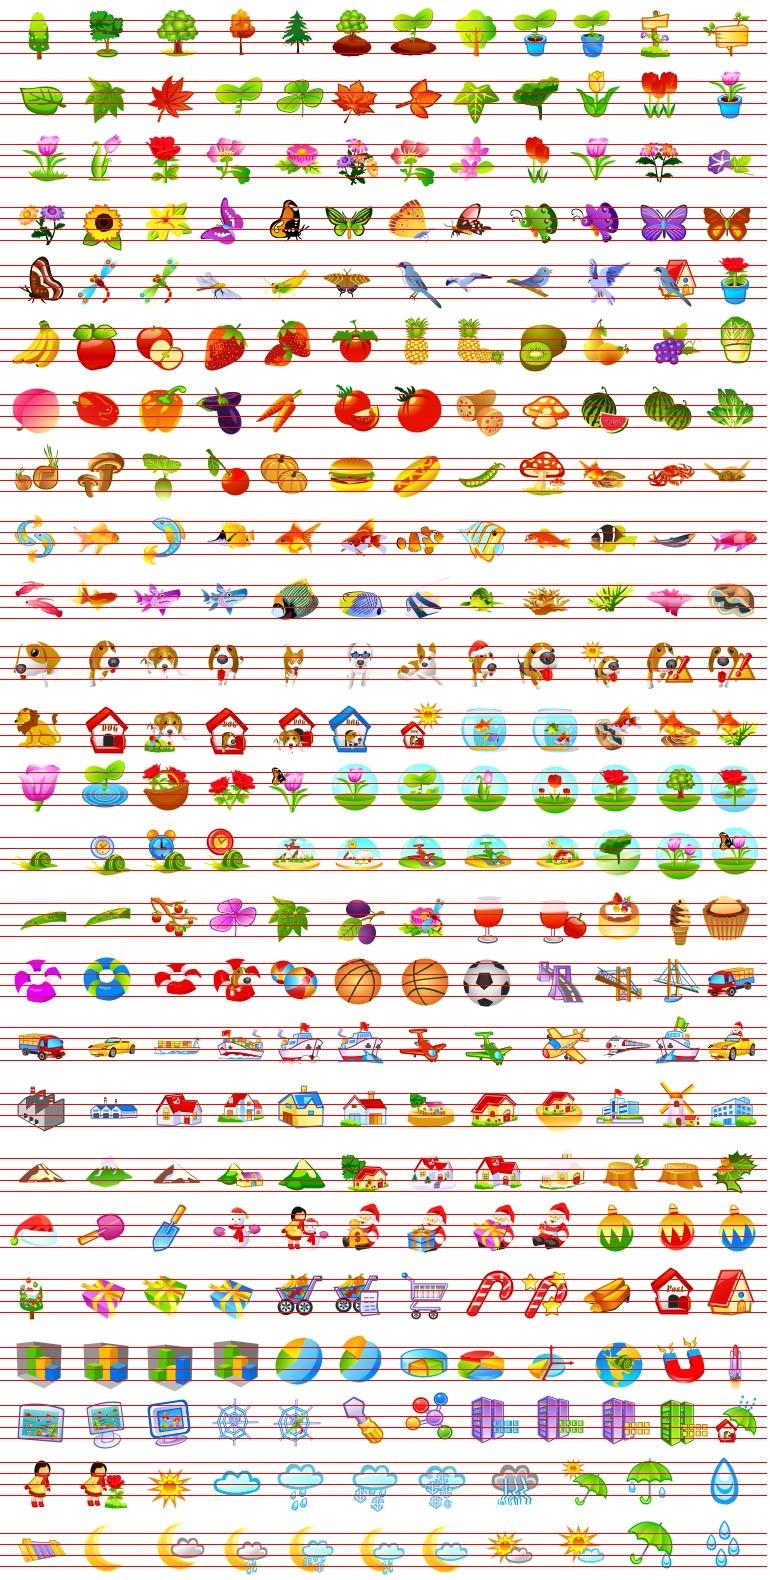 Animal and Foliage Icons